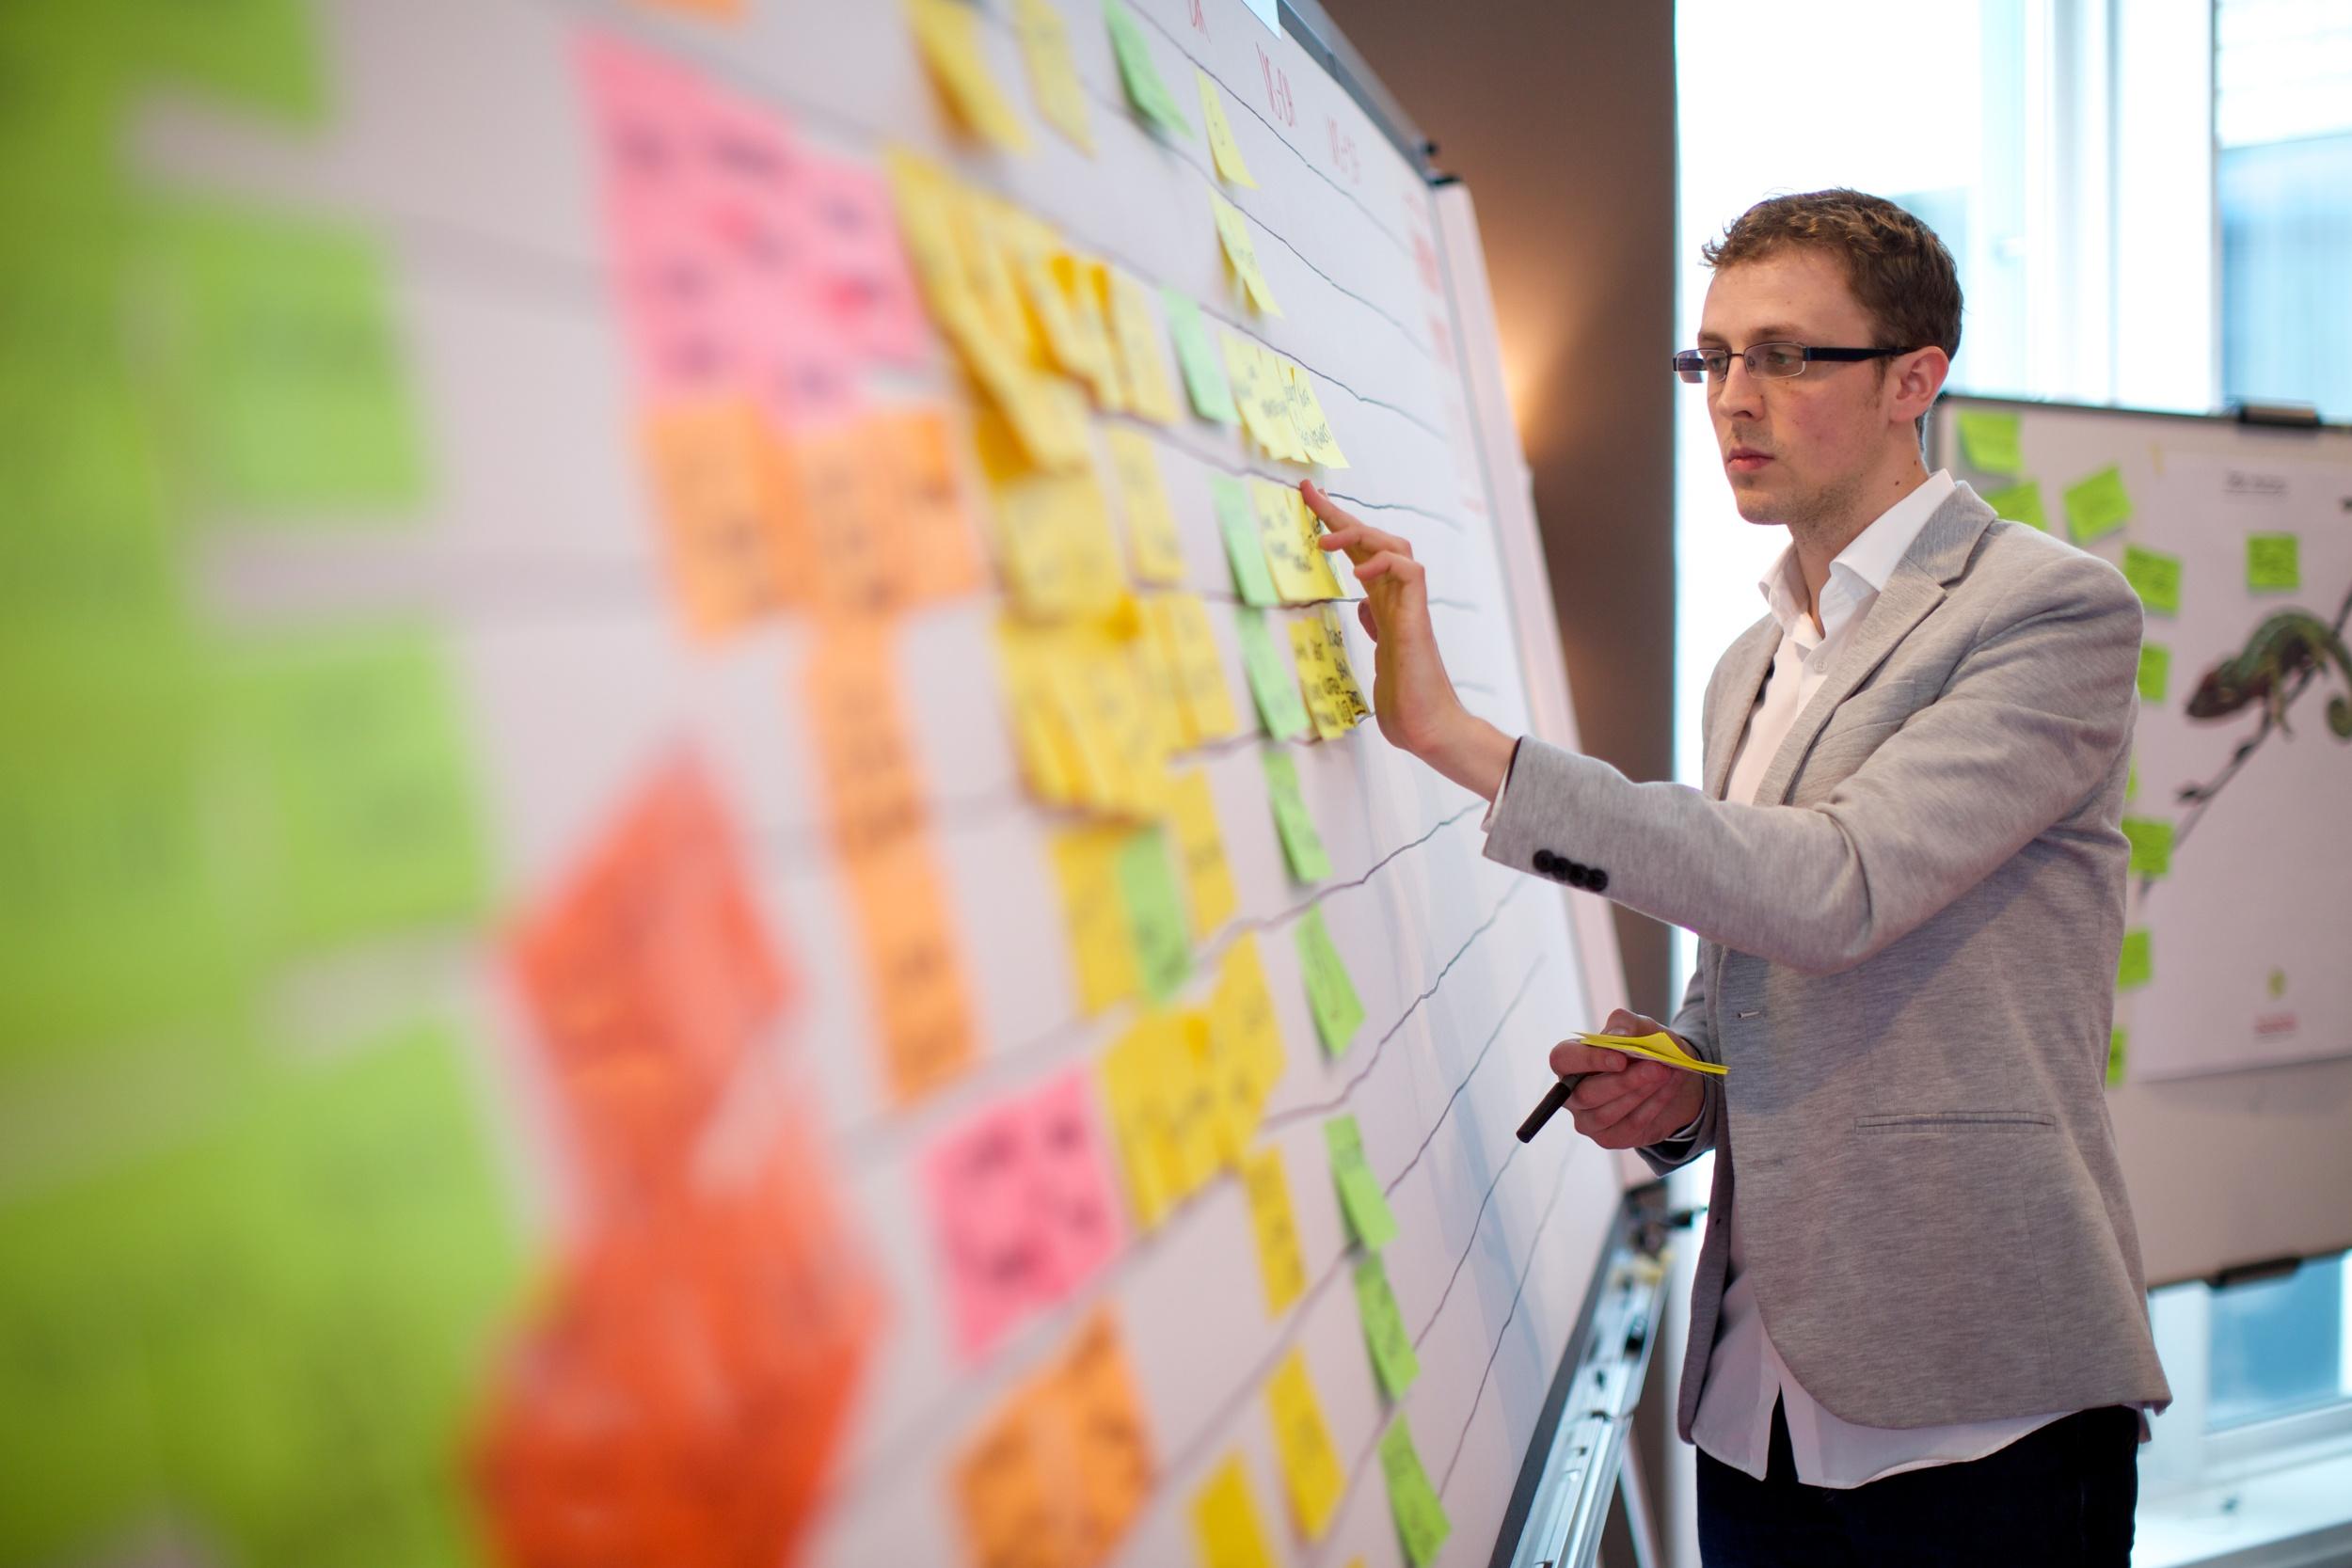 7.5 Planning with Stickies – Sebastiaan ter Burg, Business Models, Inc., Flickr